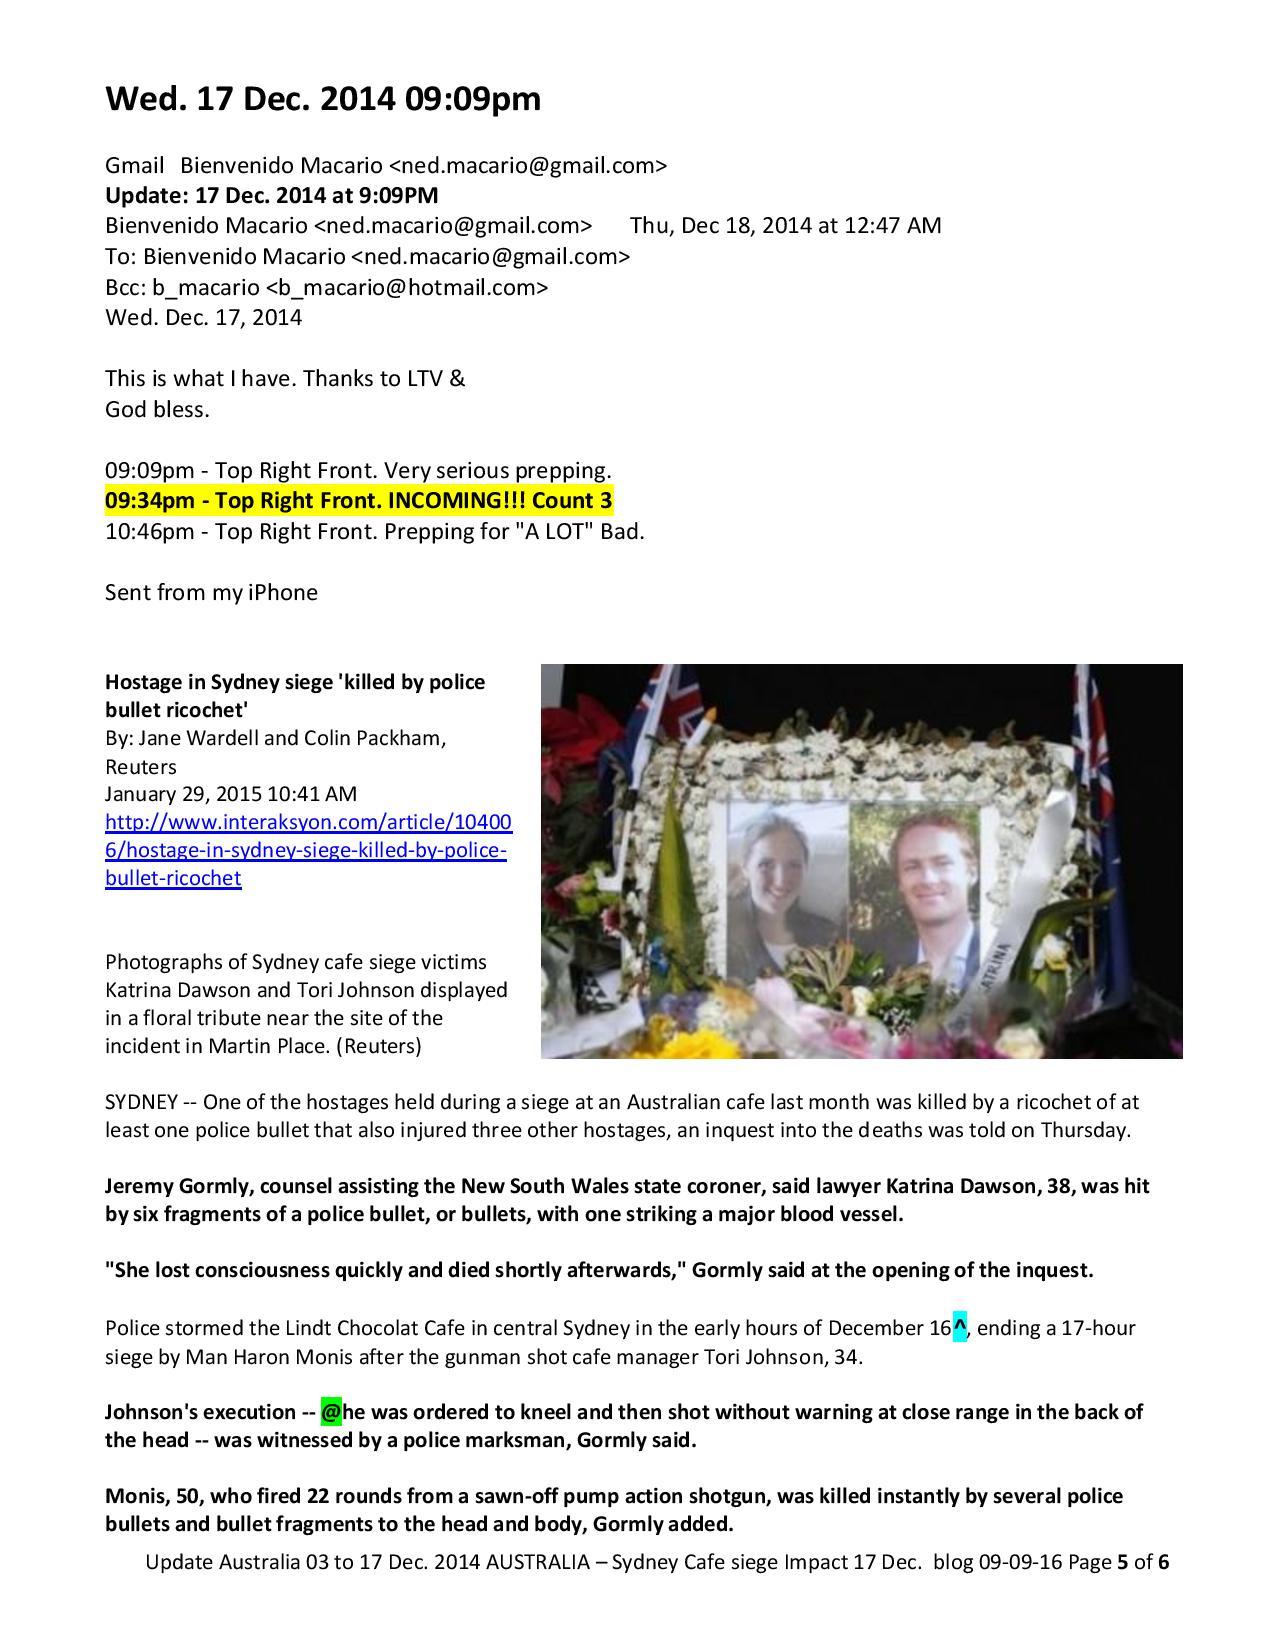 remote-viewing-australia-update-03-to-17-dec-2014-p5-sydney-cafe-siege-impact-date-17-dec-2014